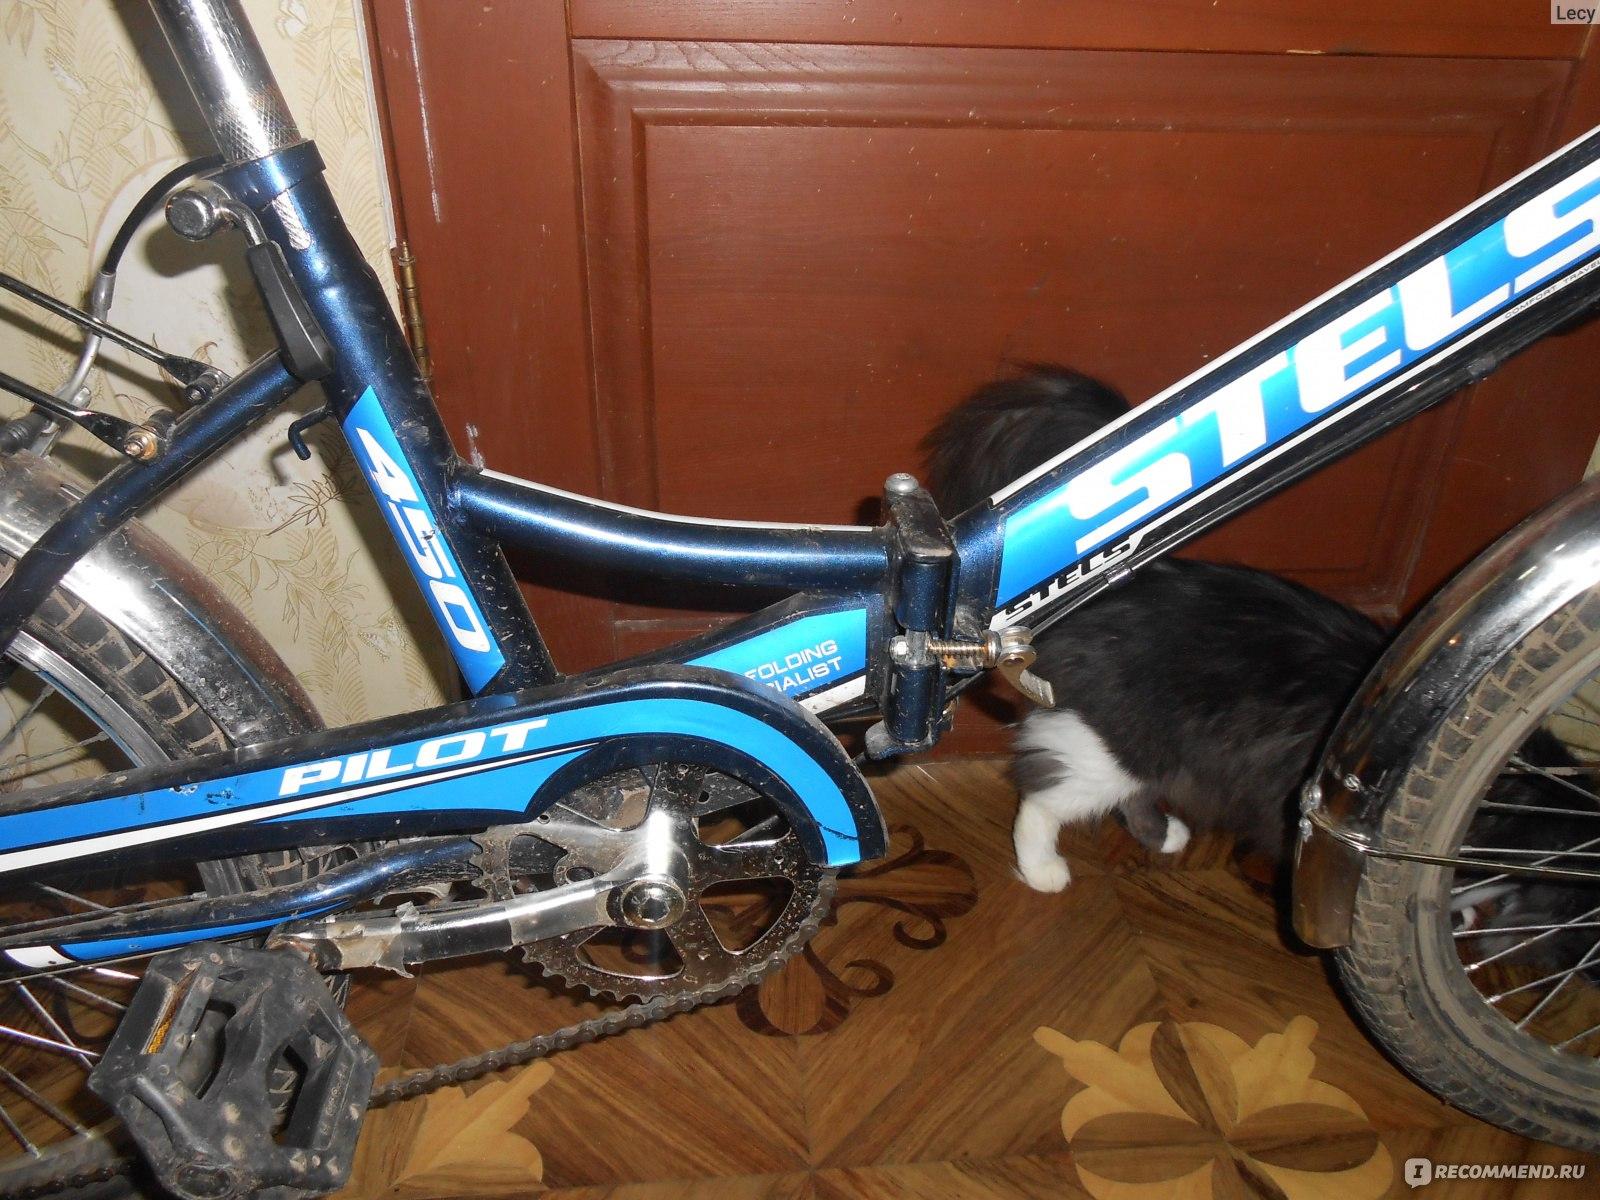 Folding bike Stels Pilot 450